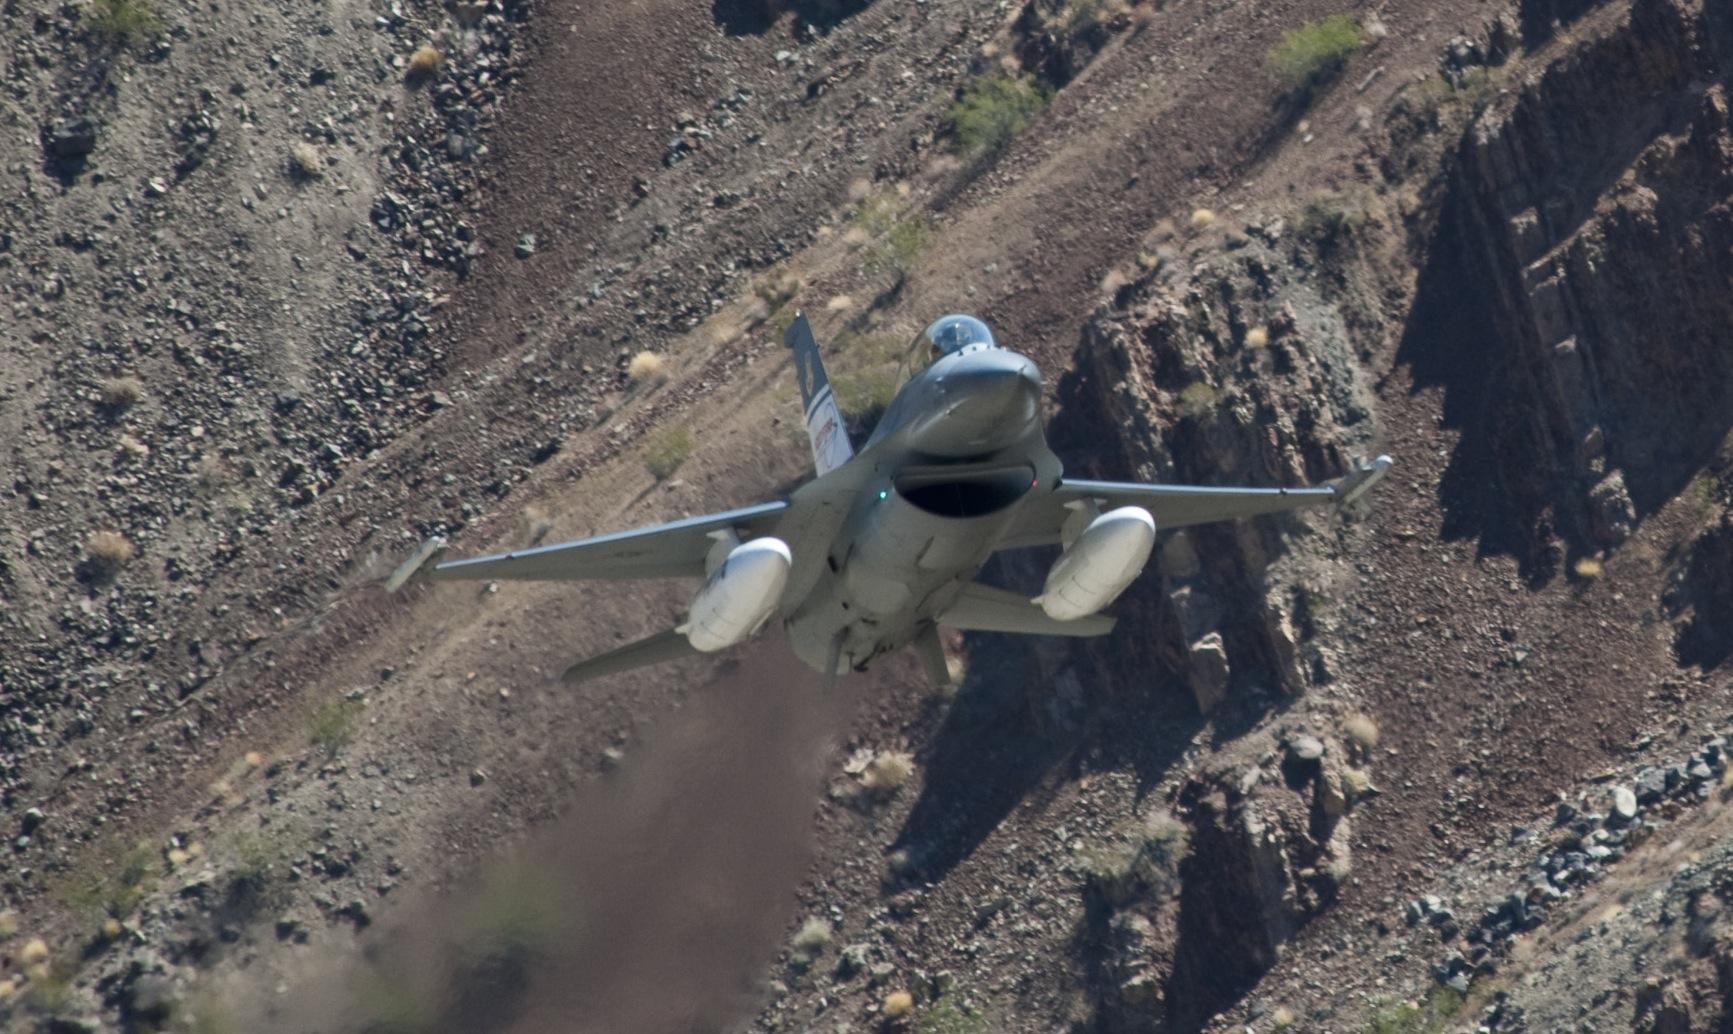 Automatic Collision Avoidance Technology NASA - Mountainous terrain aircraft accidents map us